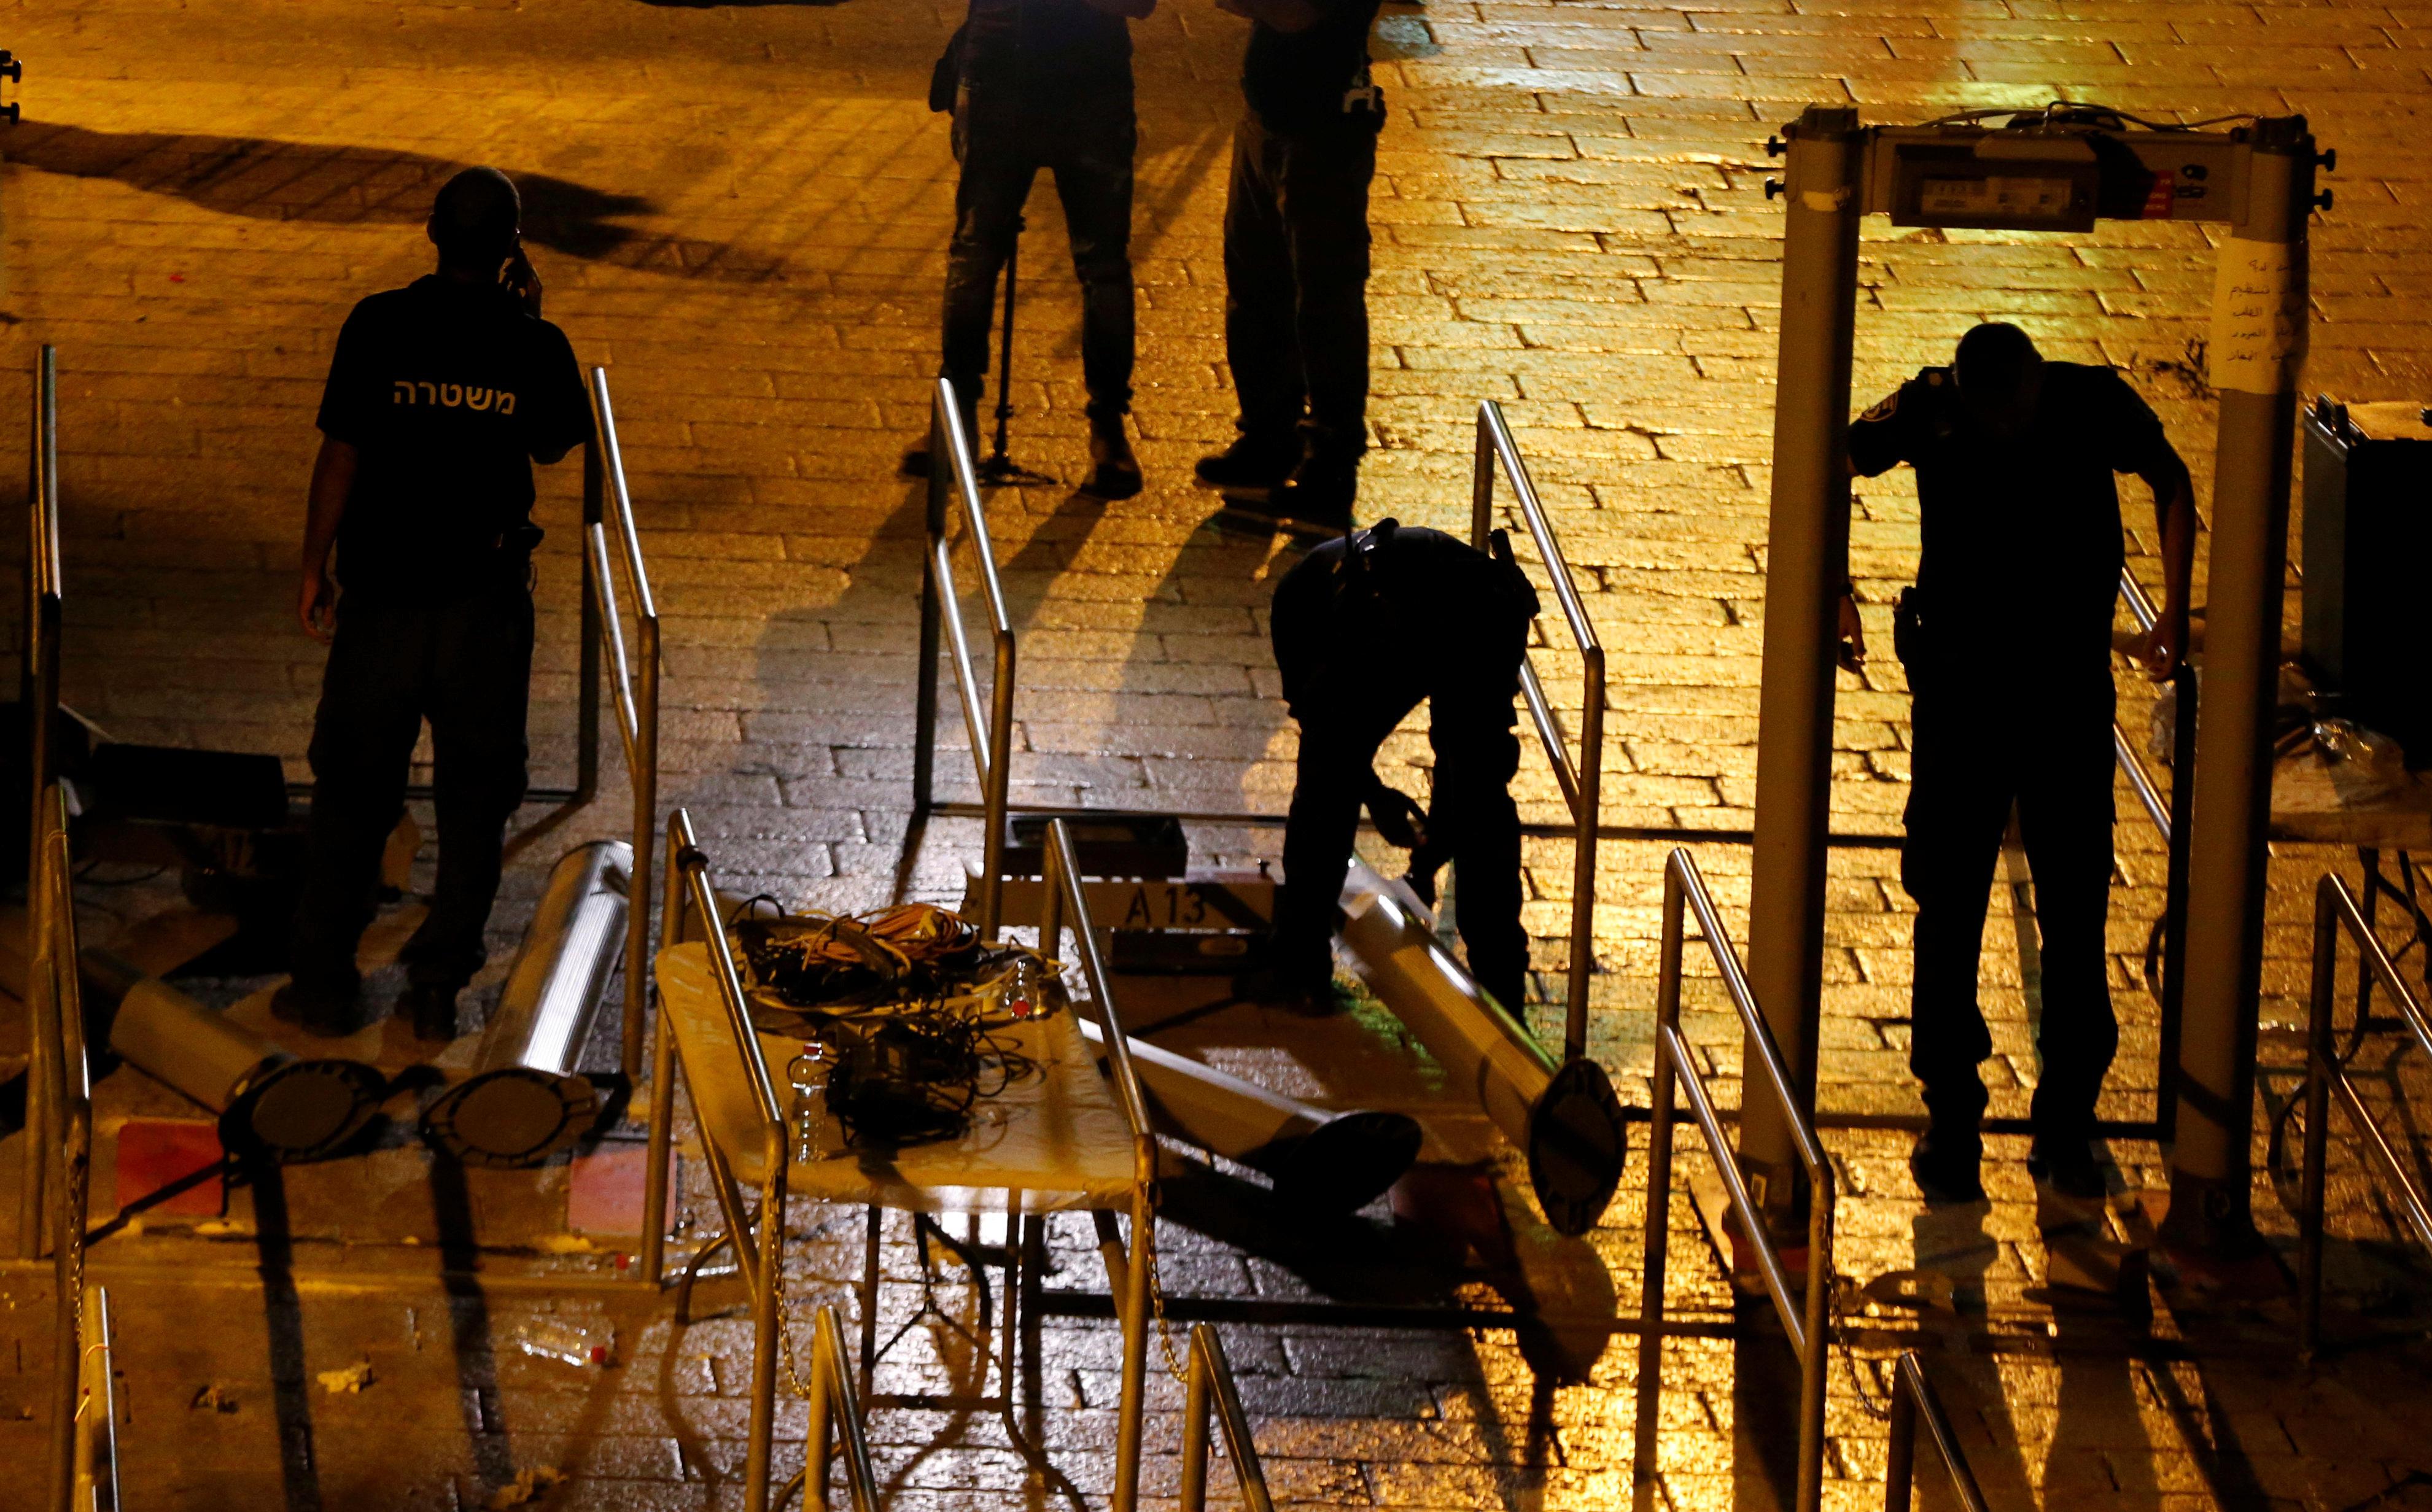 Israel starts removing metal detectors from Jerusalem holy site